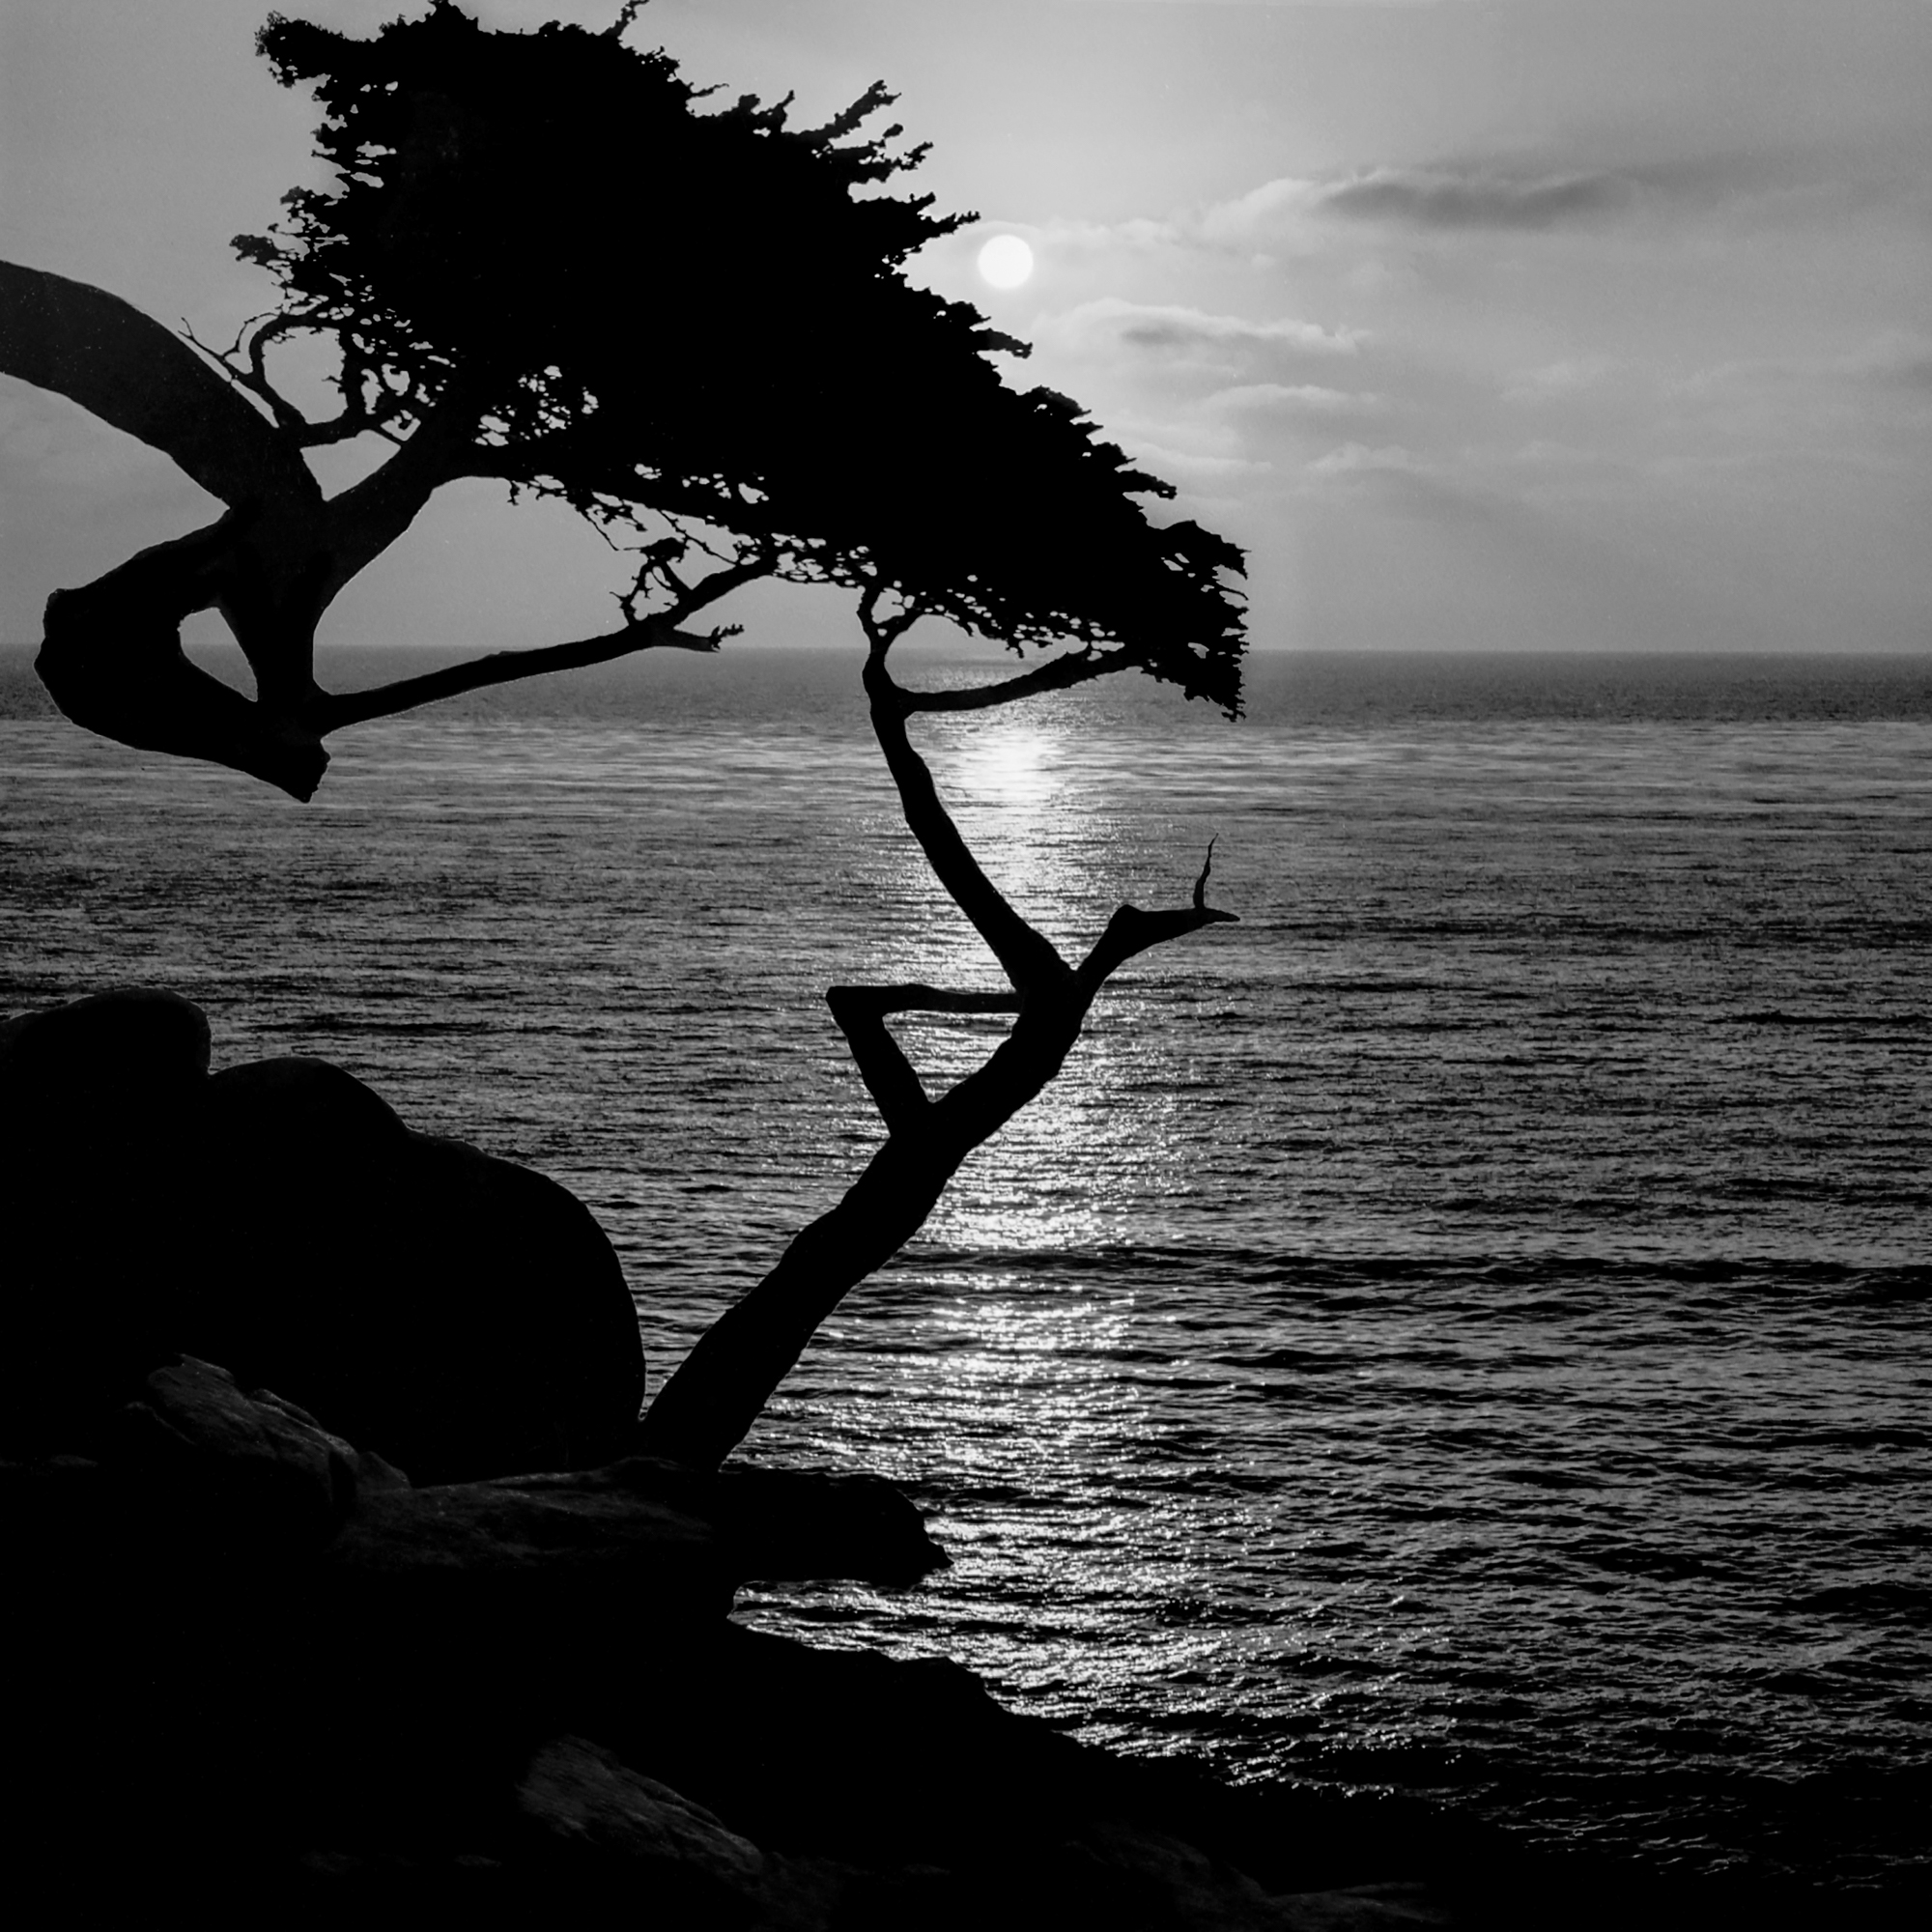 Lone_Cypress-moonlight